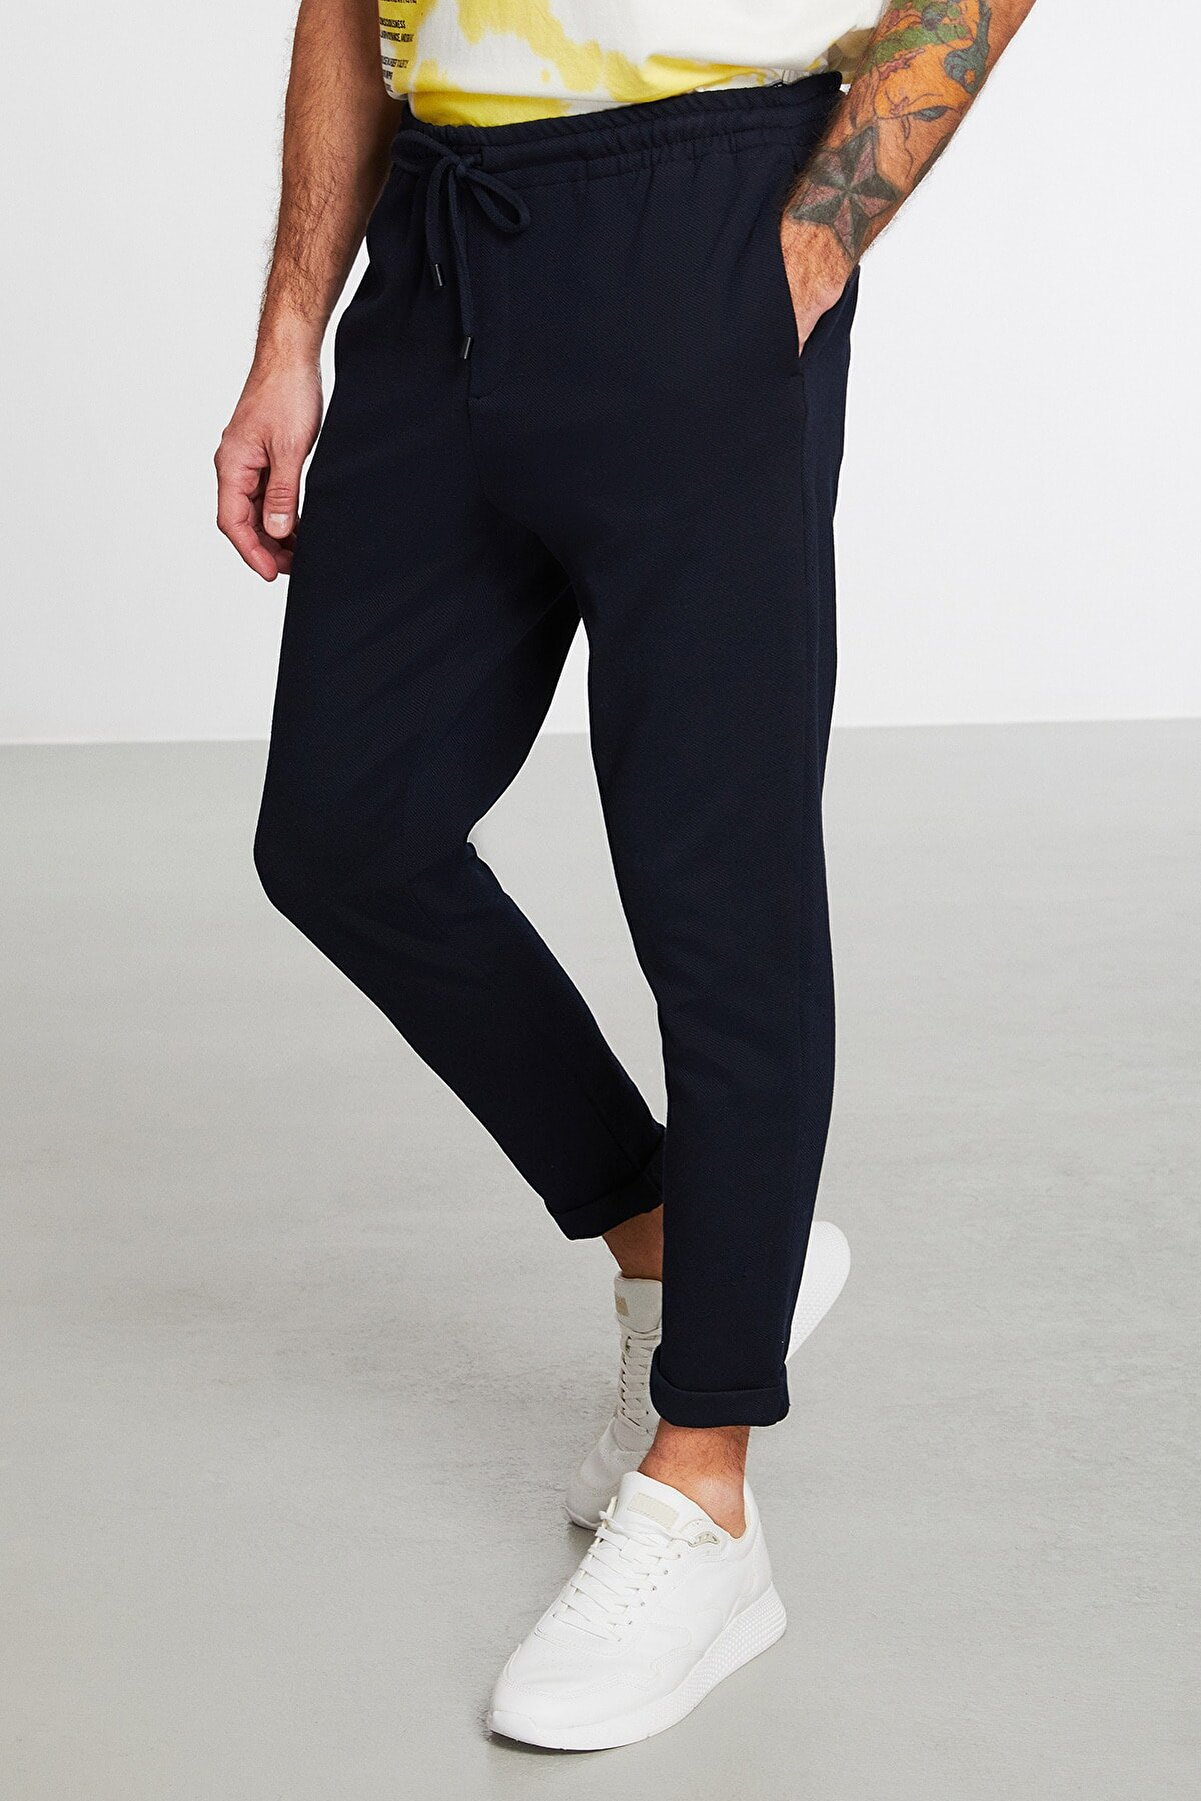 GRIMELANGE Unblended Erkek Lacivert Düz Renk Pantolon